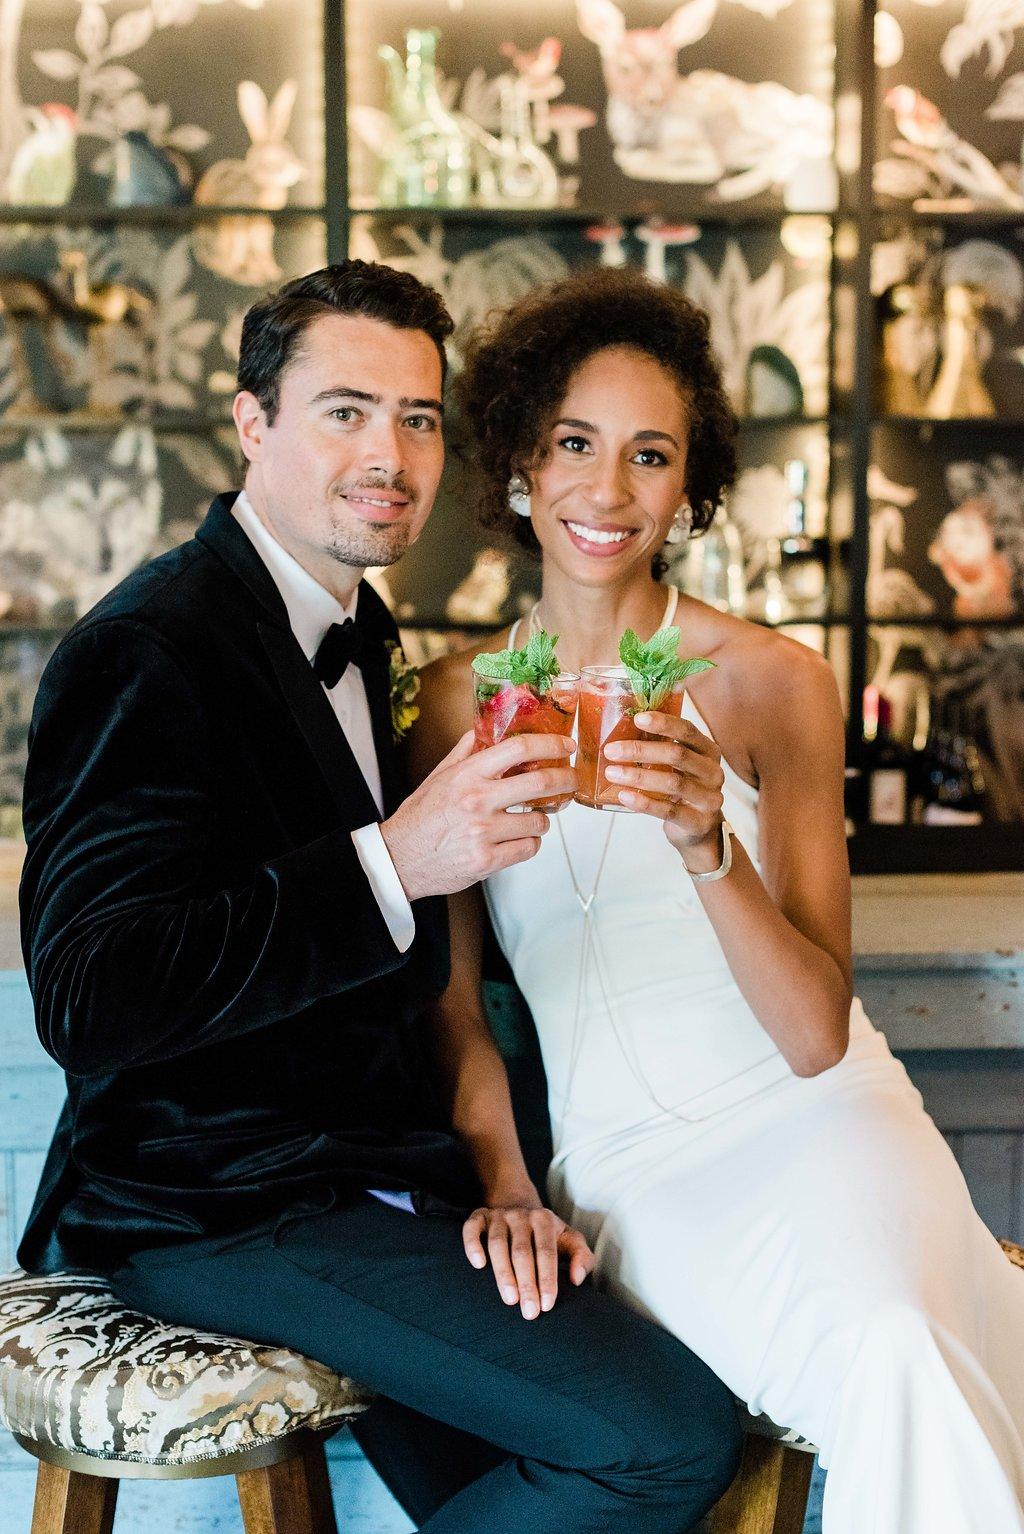 Lemon and Lime: Modern Spring Wedding Inspiration at The Lodge at Malibu Lake